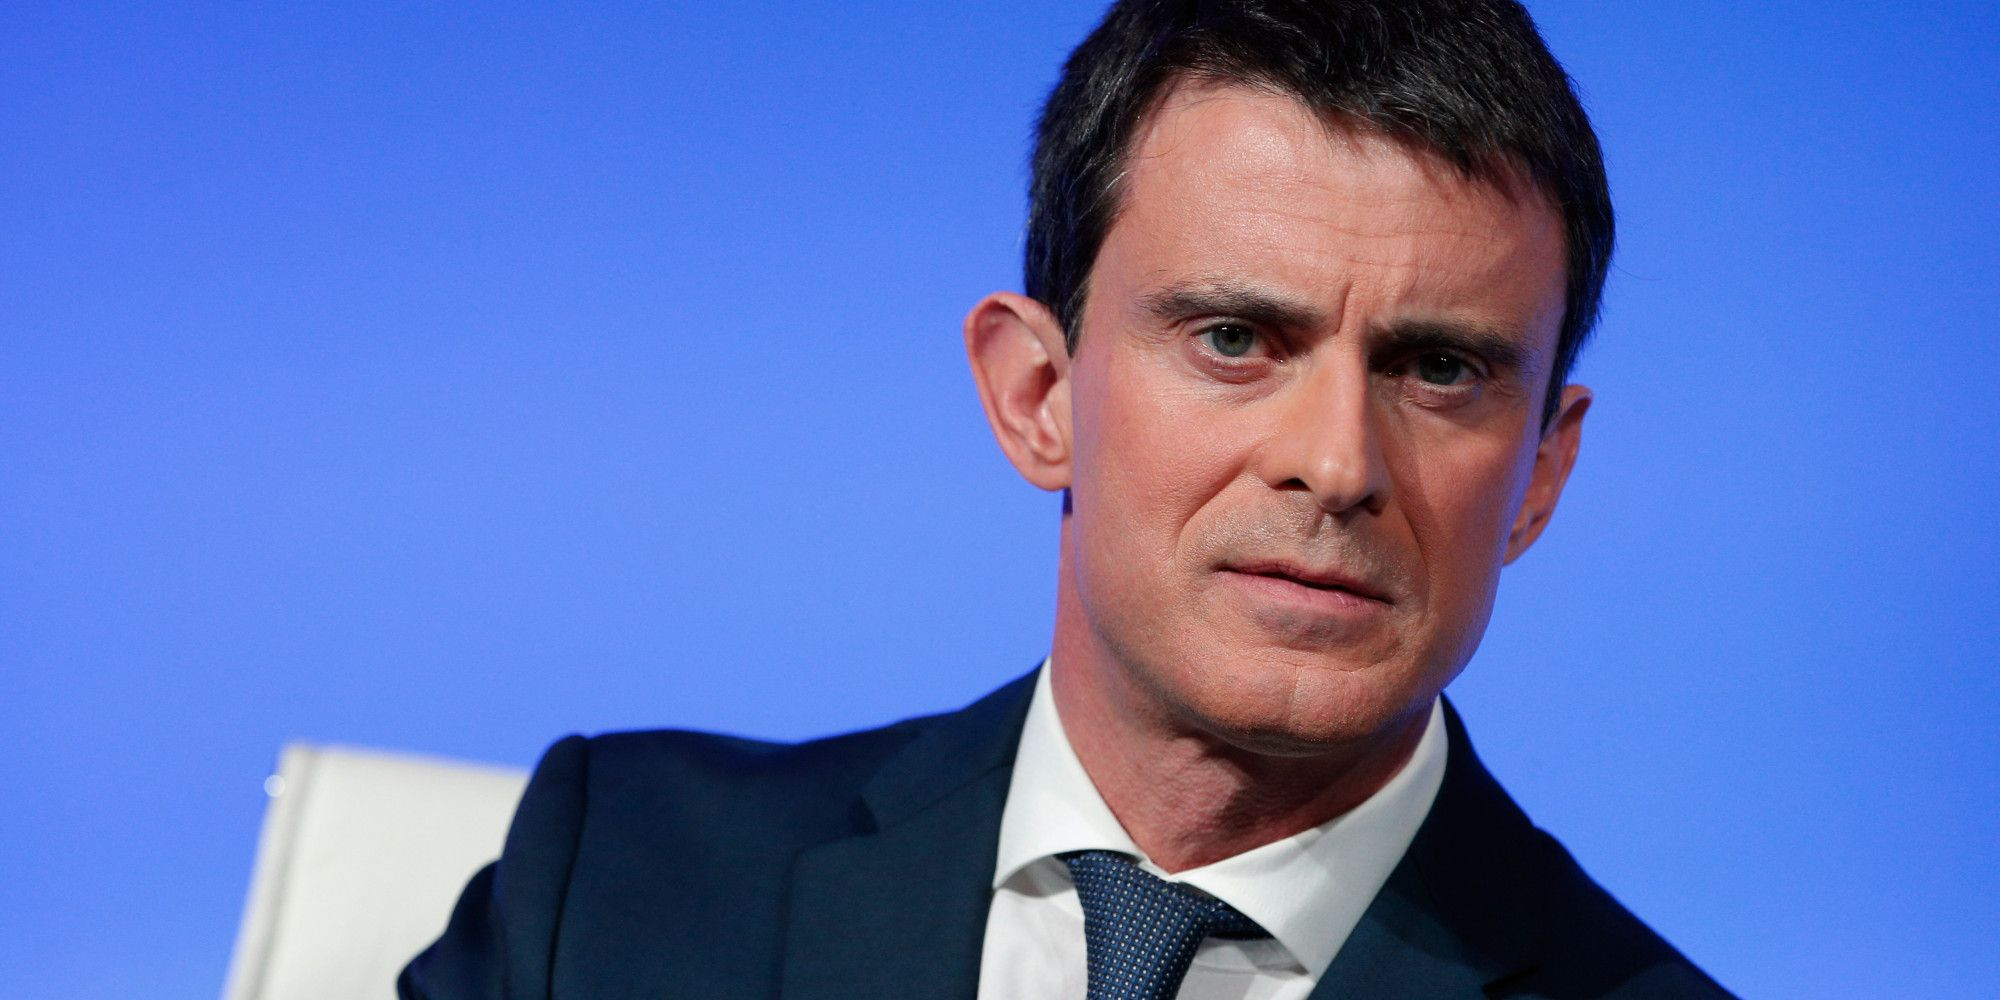 #En France, les femmes sont libres - Le Huffington Post: Le Huffington Post En France, les femmes sont libres Le Huffington Post Je tenais…